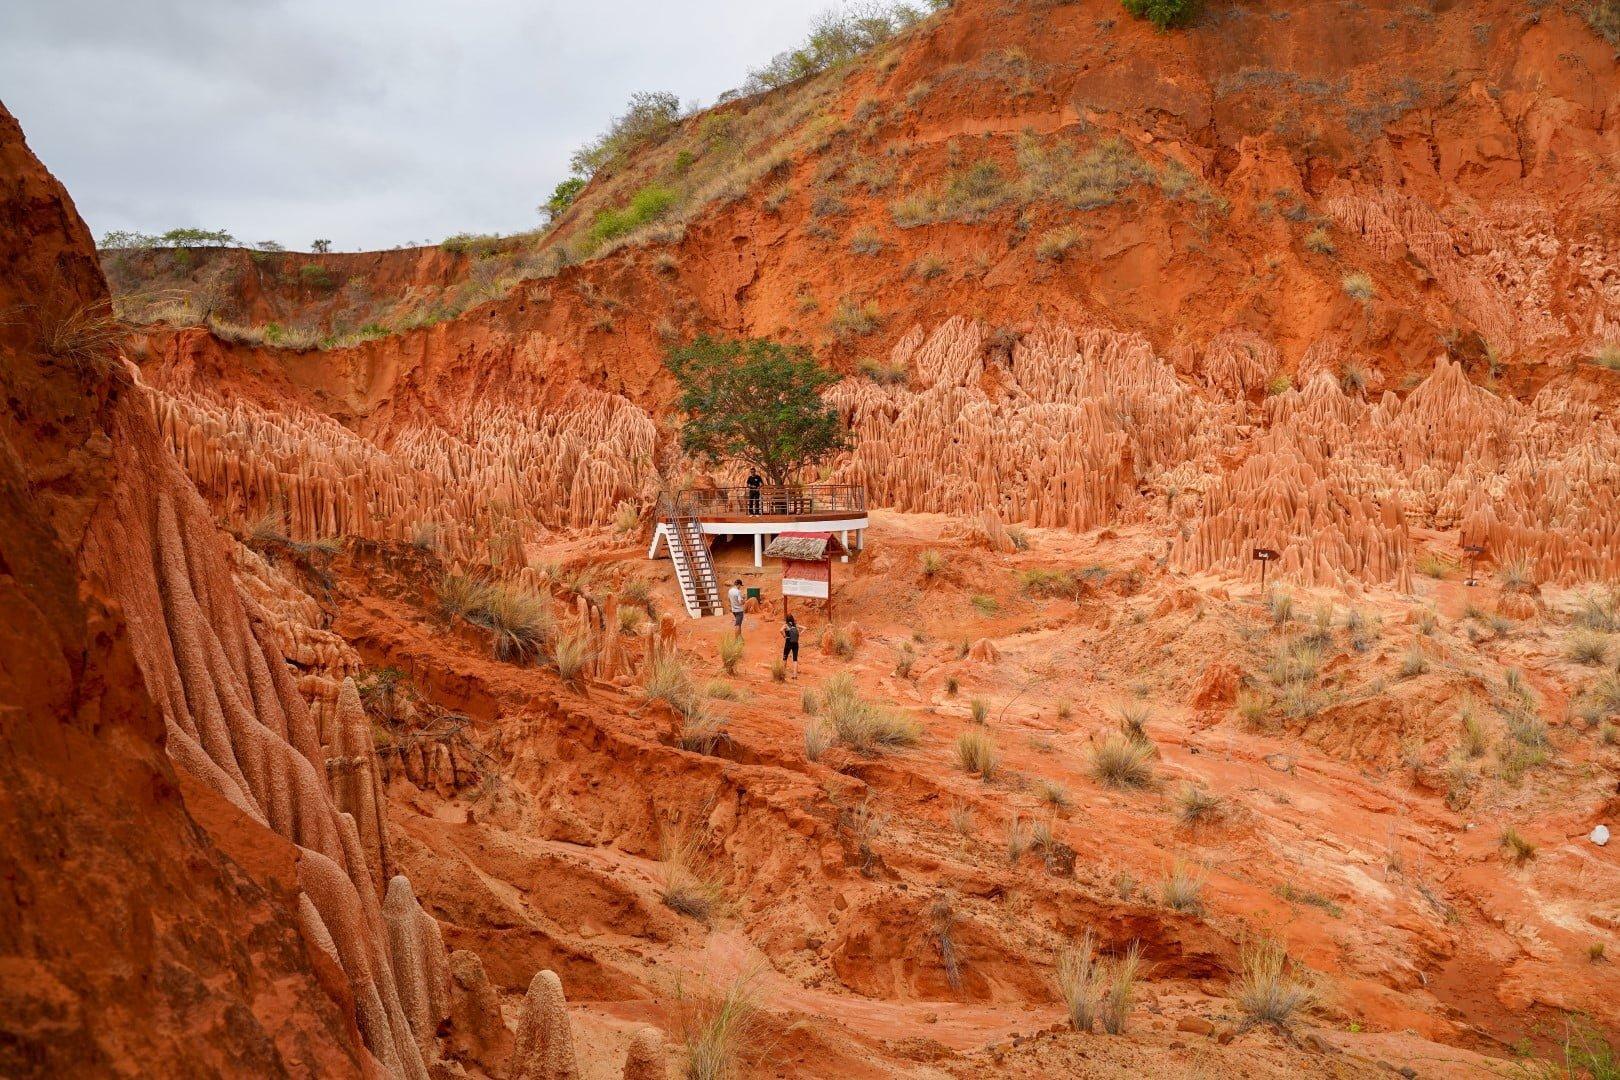 Tsingy Rouge limestone park na Madagaskarju - zanimiv izlet za en dan